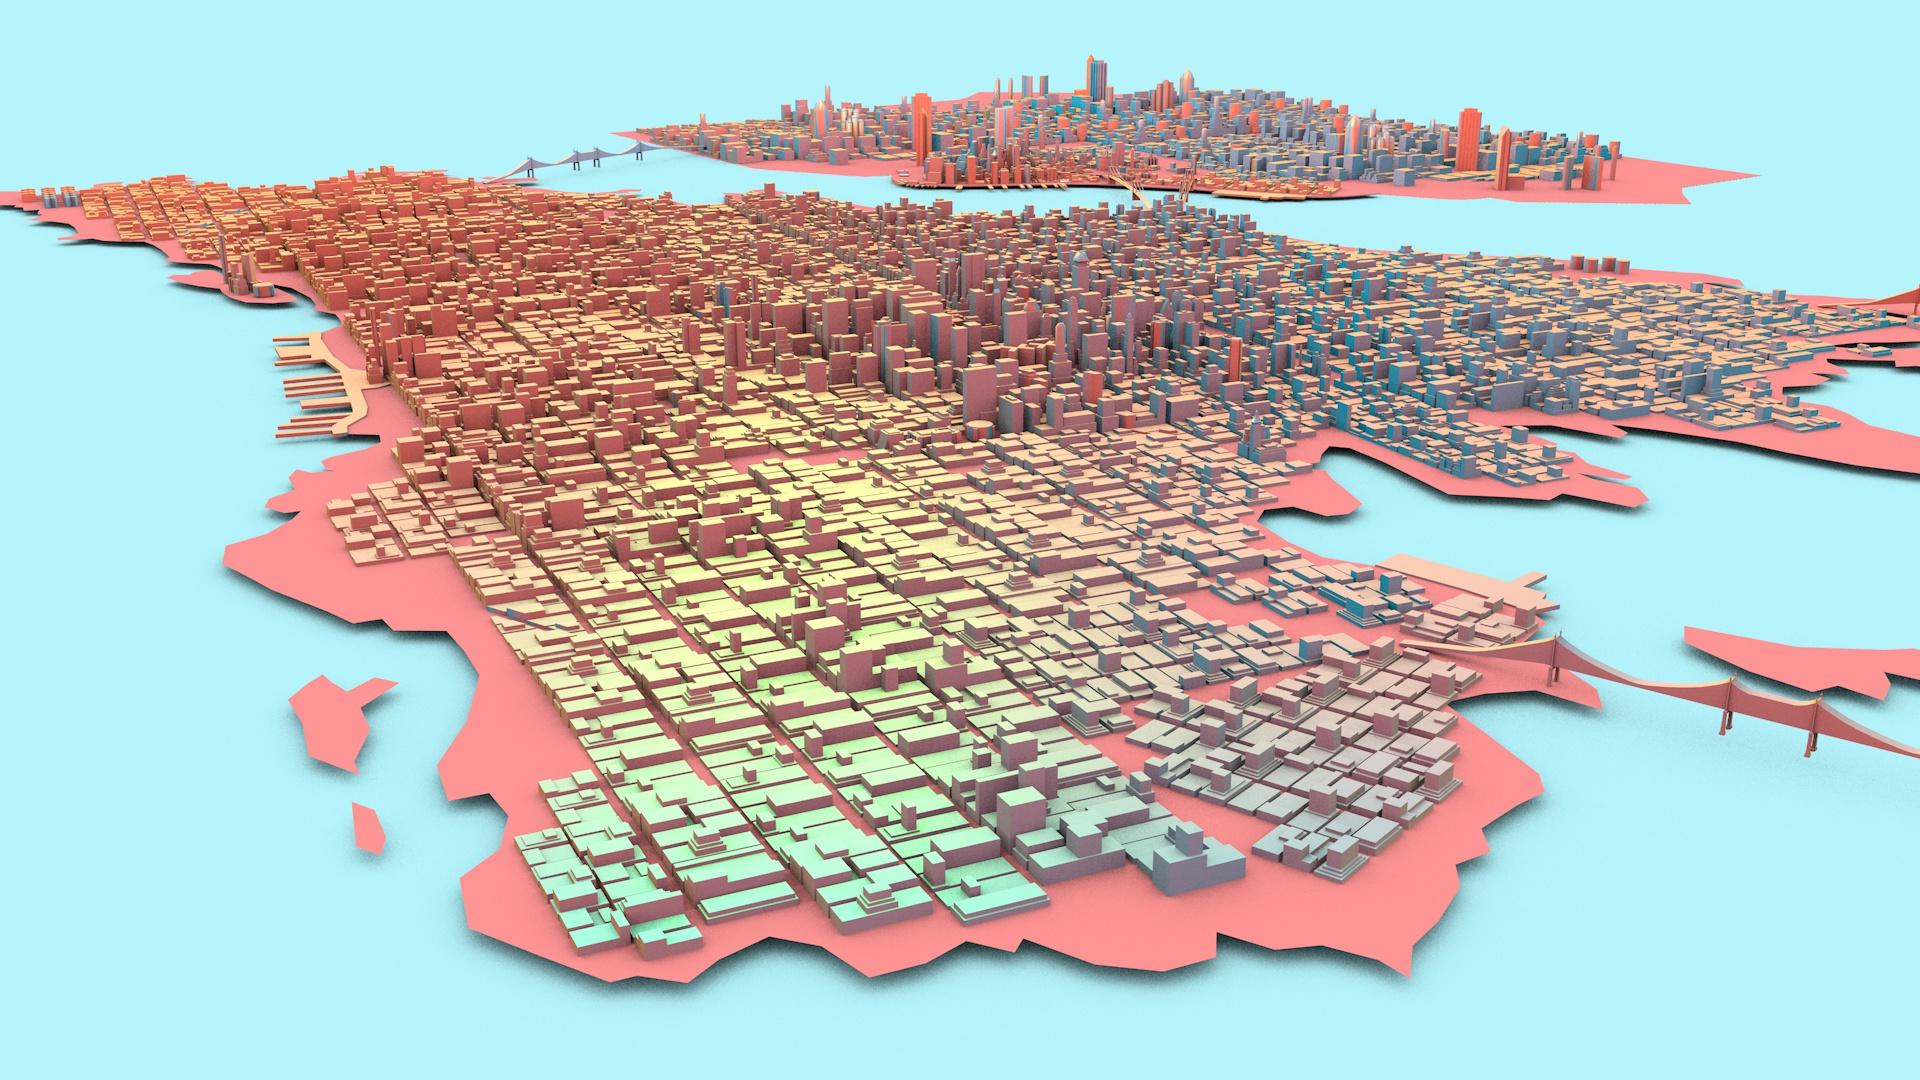 CITY ABOVE 9.jpg